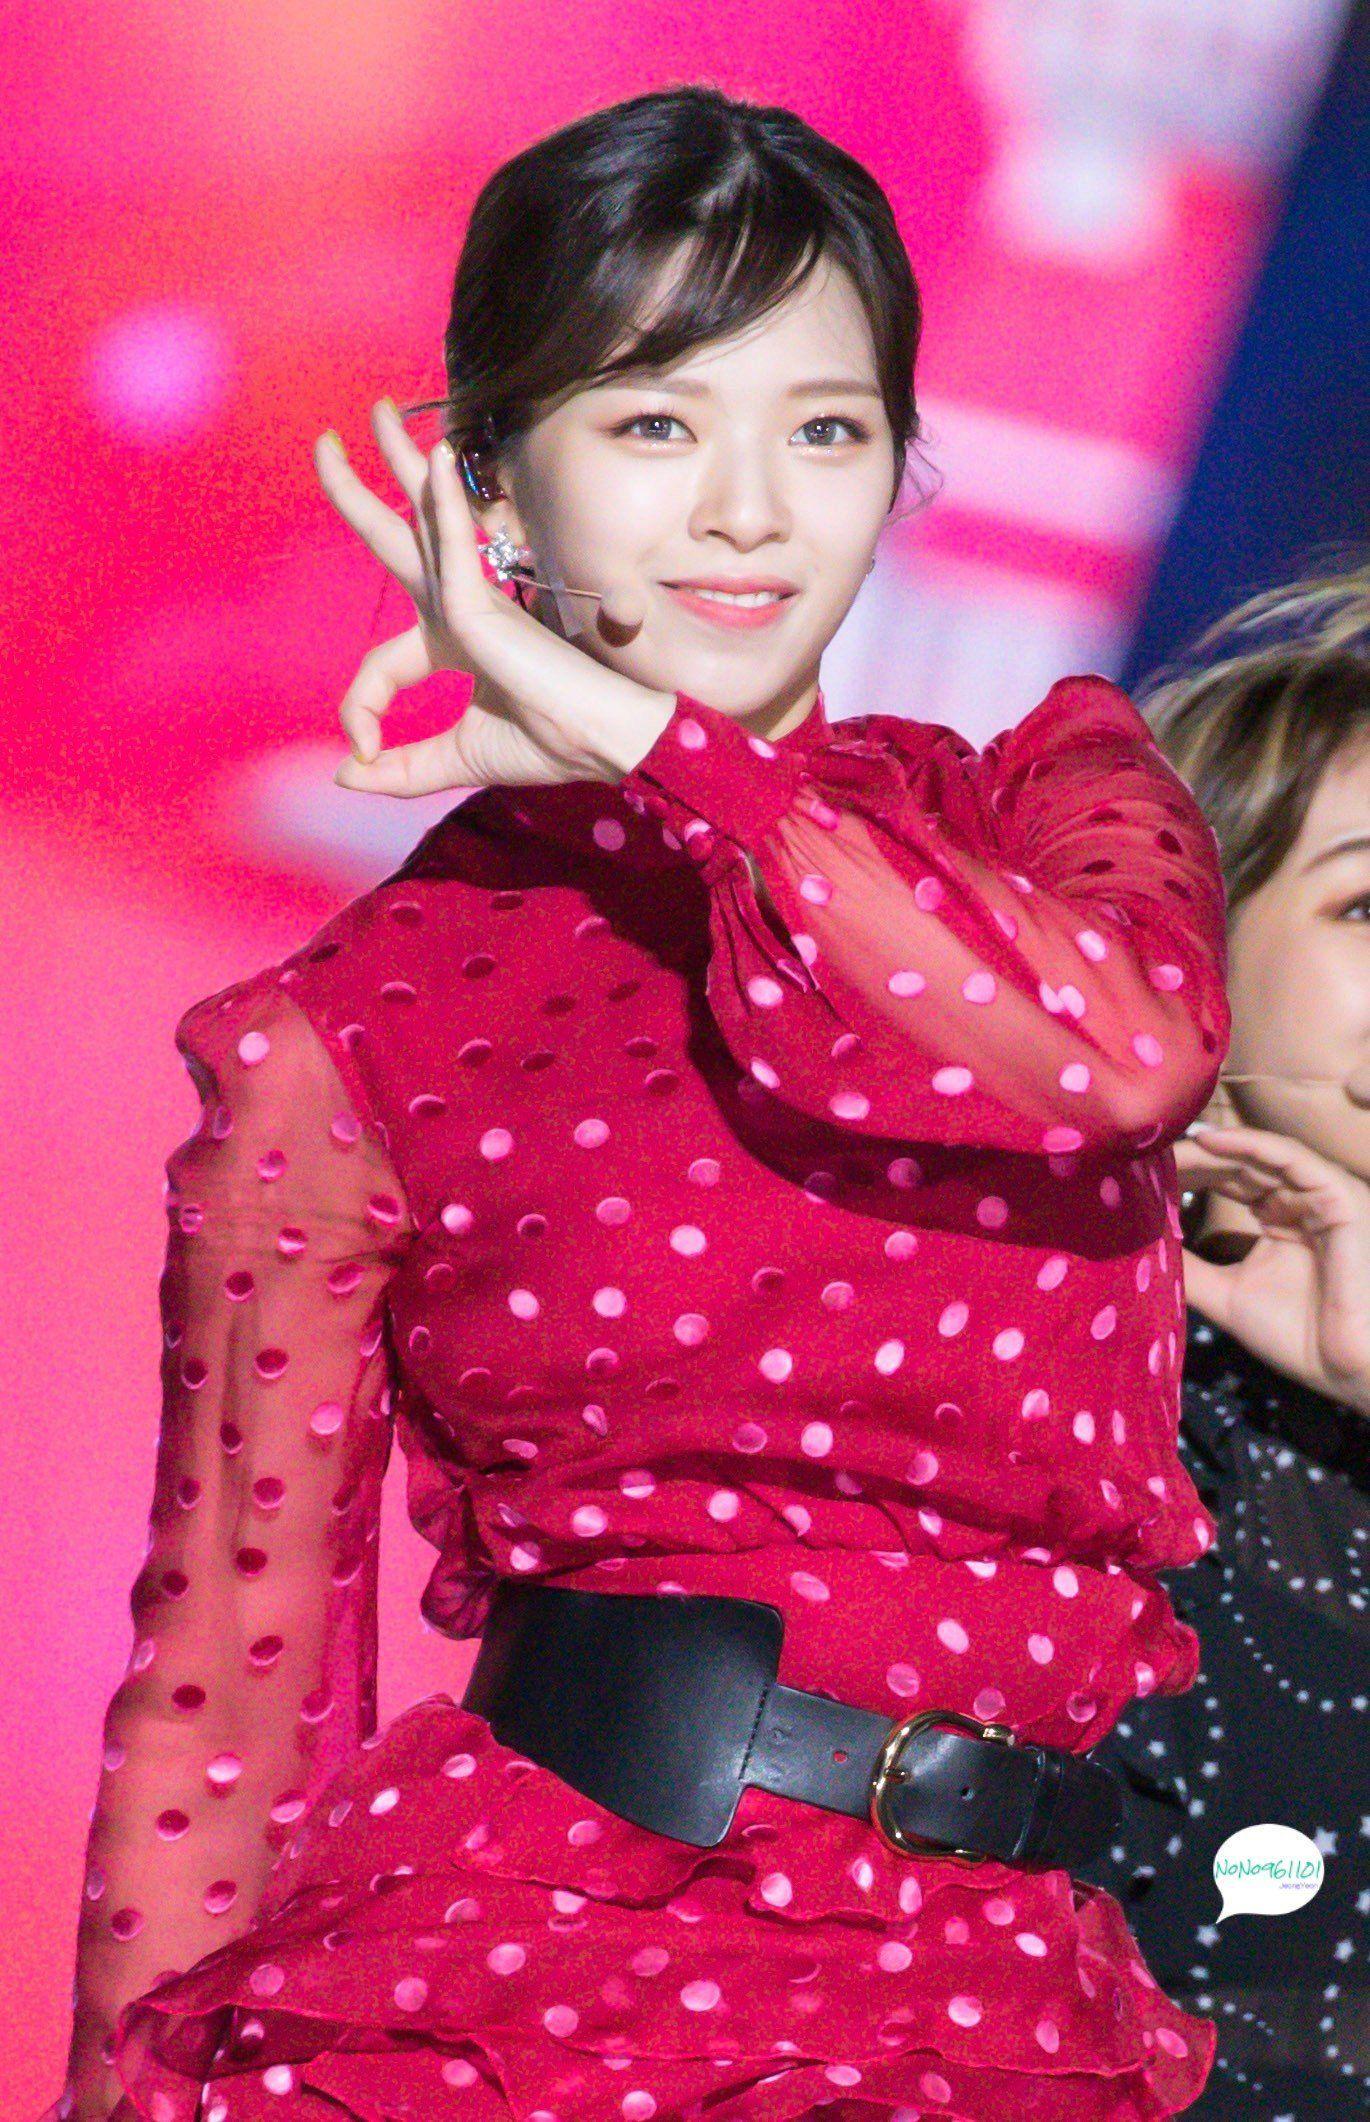 Pin by Kaylie 🍒⚡️🌈 on JeongYeon Kpop girls, Korean idol